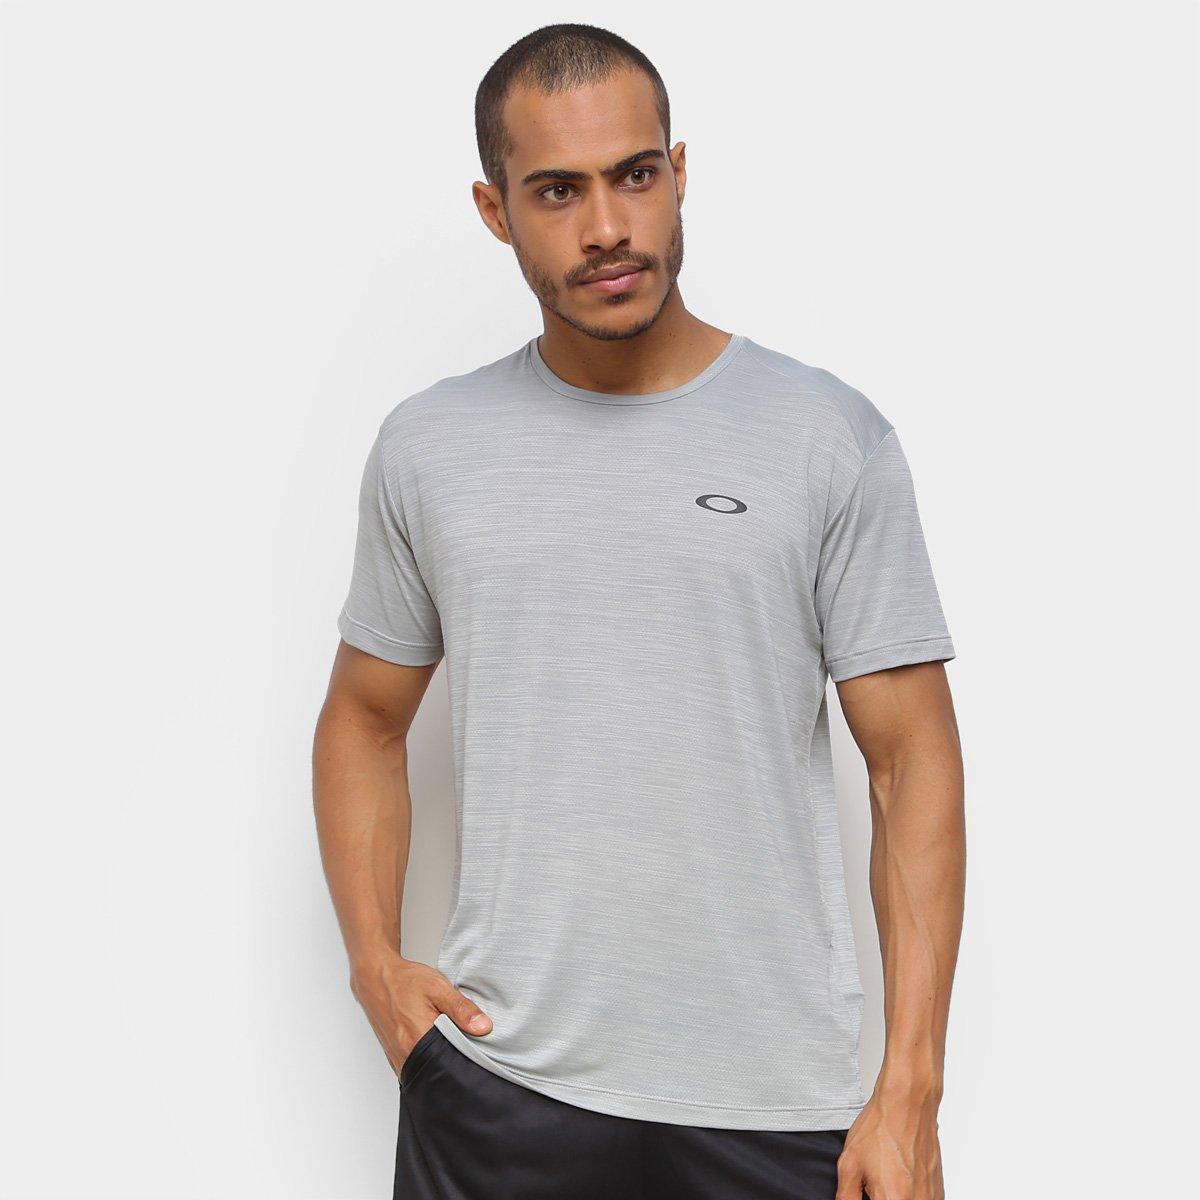 Camiseta Oakley Trn Vapor Essential Masculina